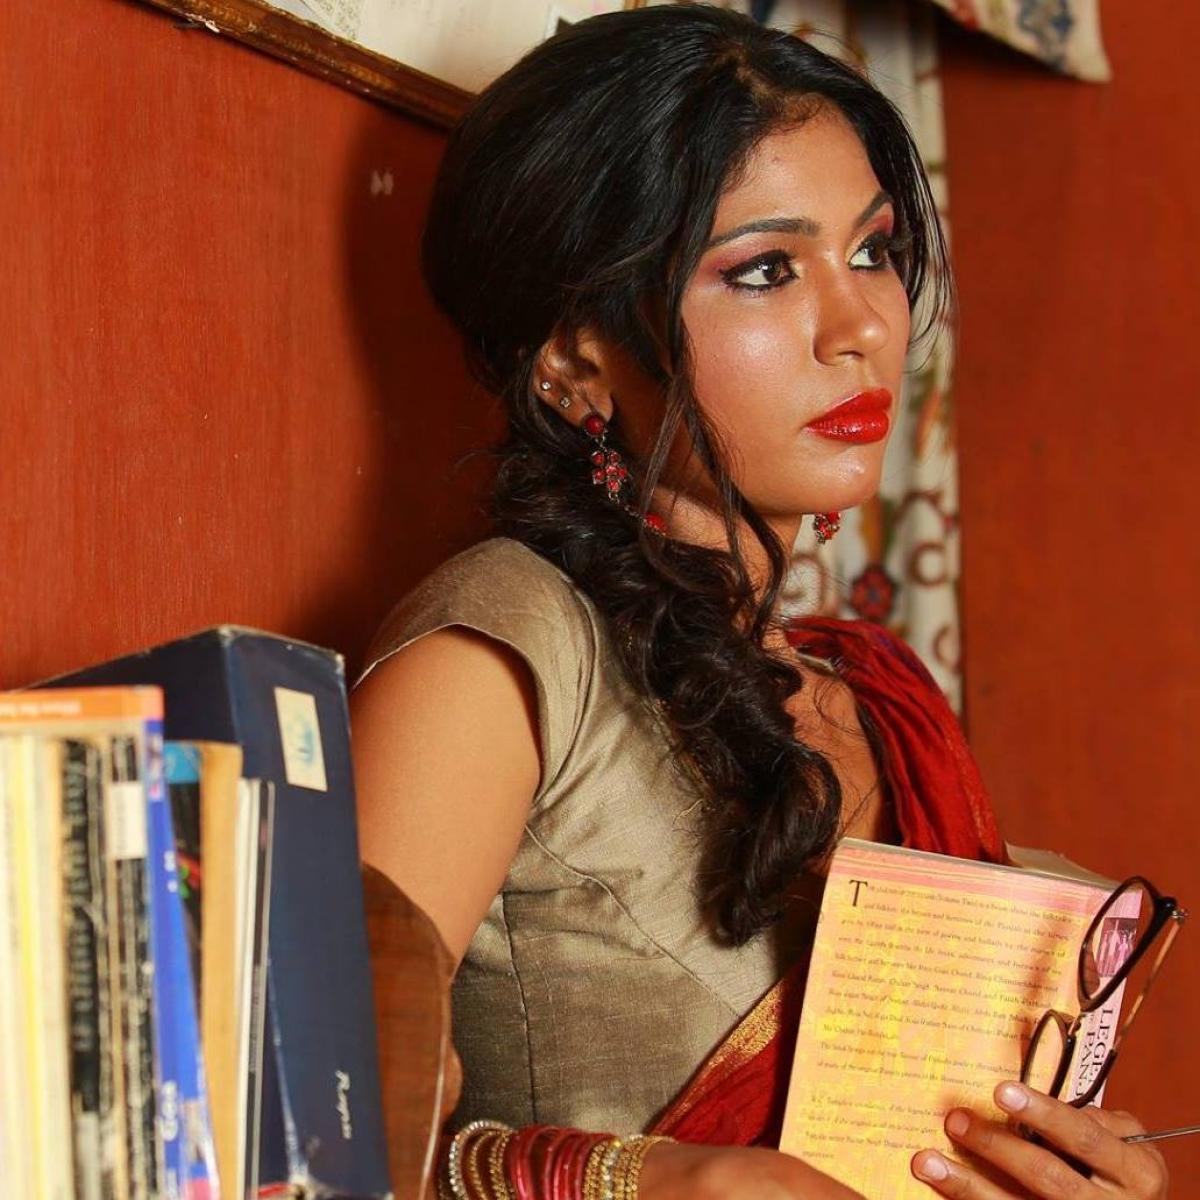 Video spreading obscenity, Supreme Court tells activist Rehana Fathima, rejects plea